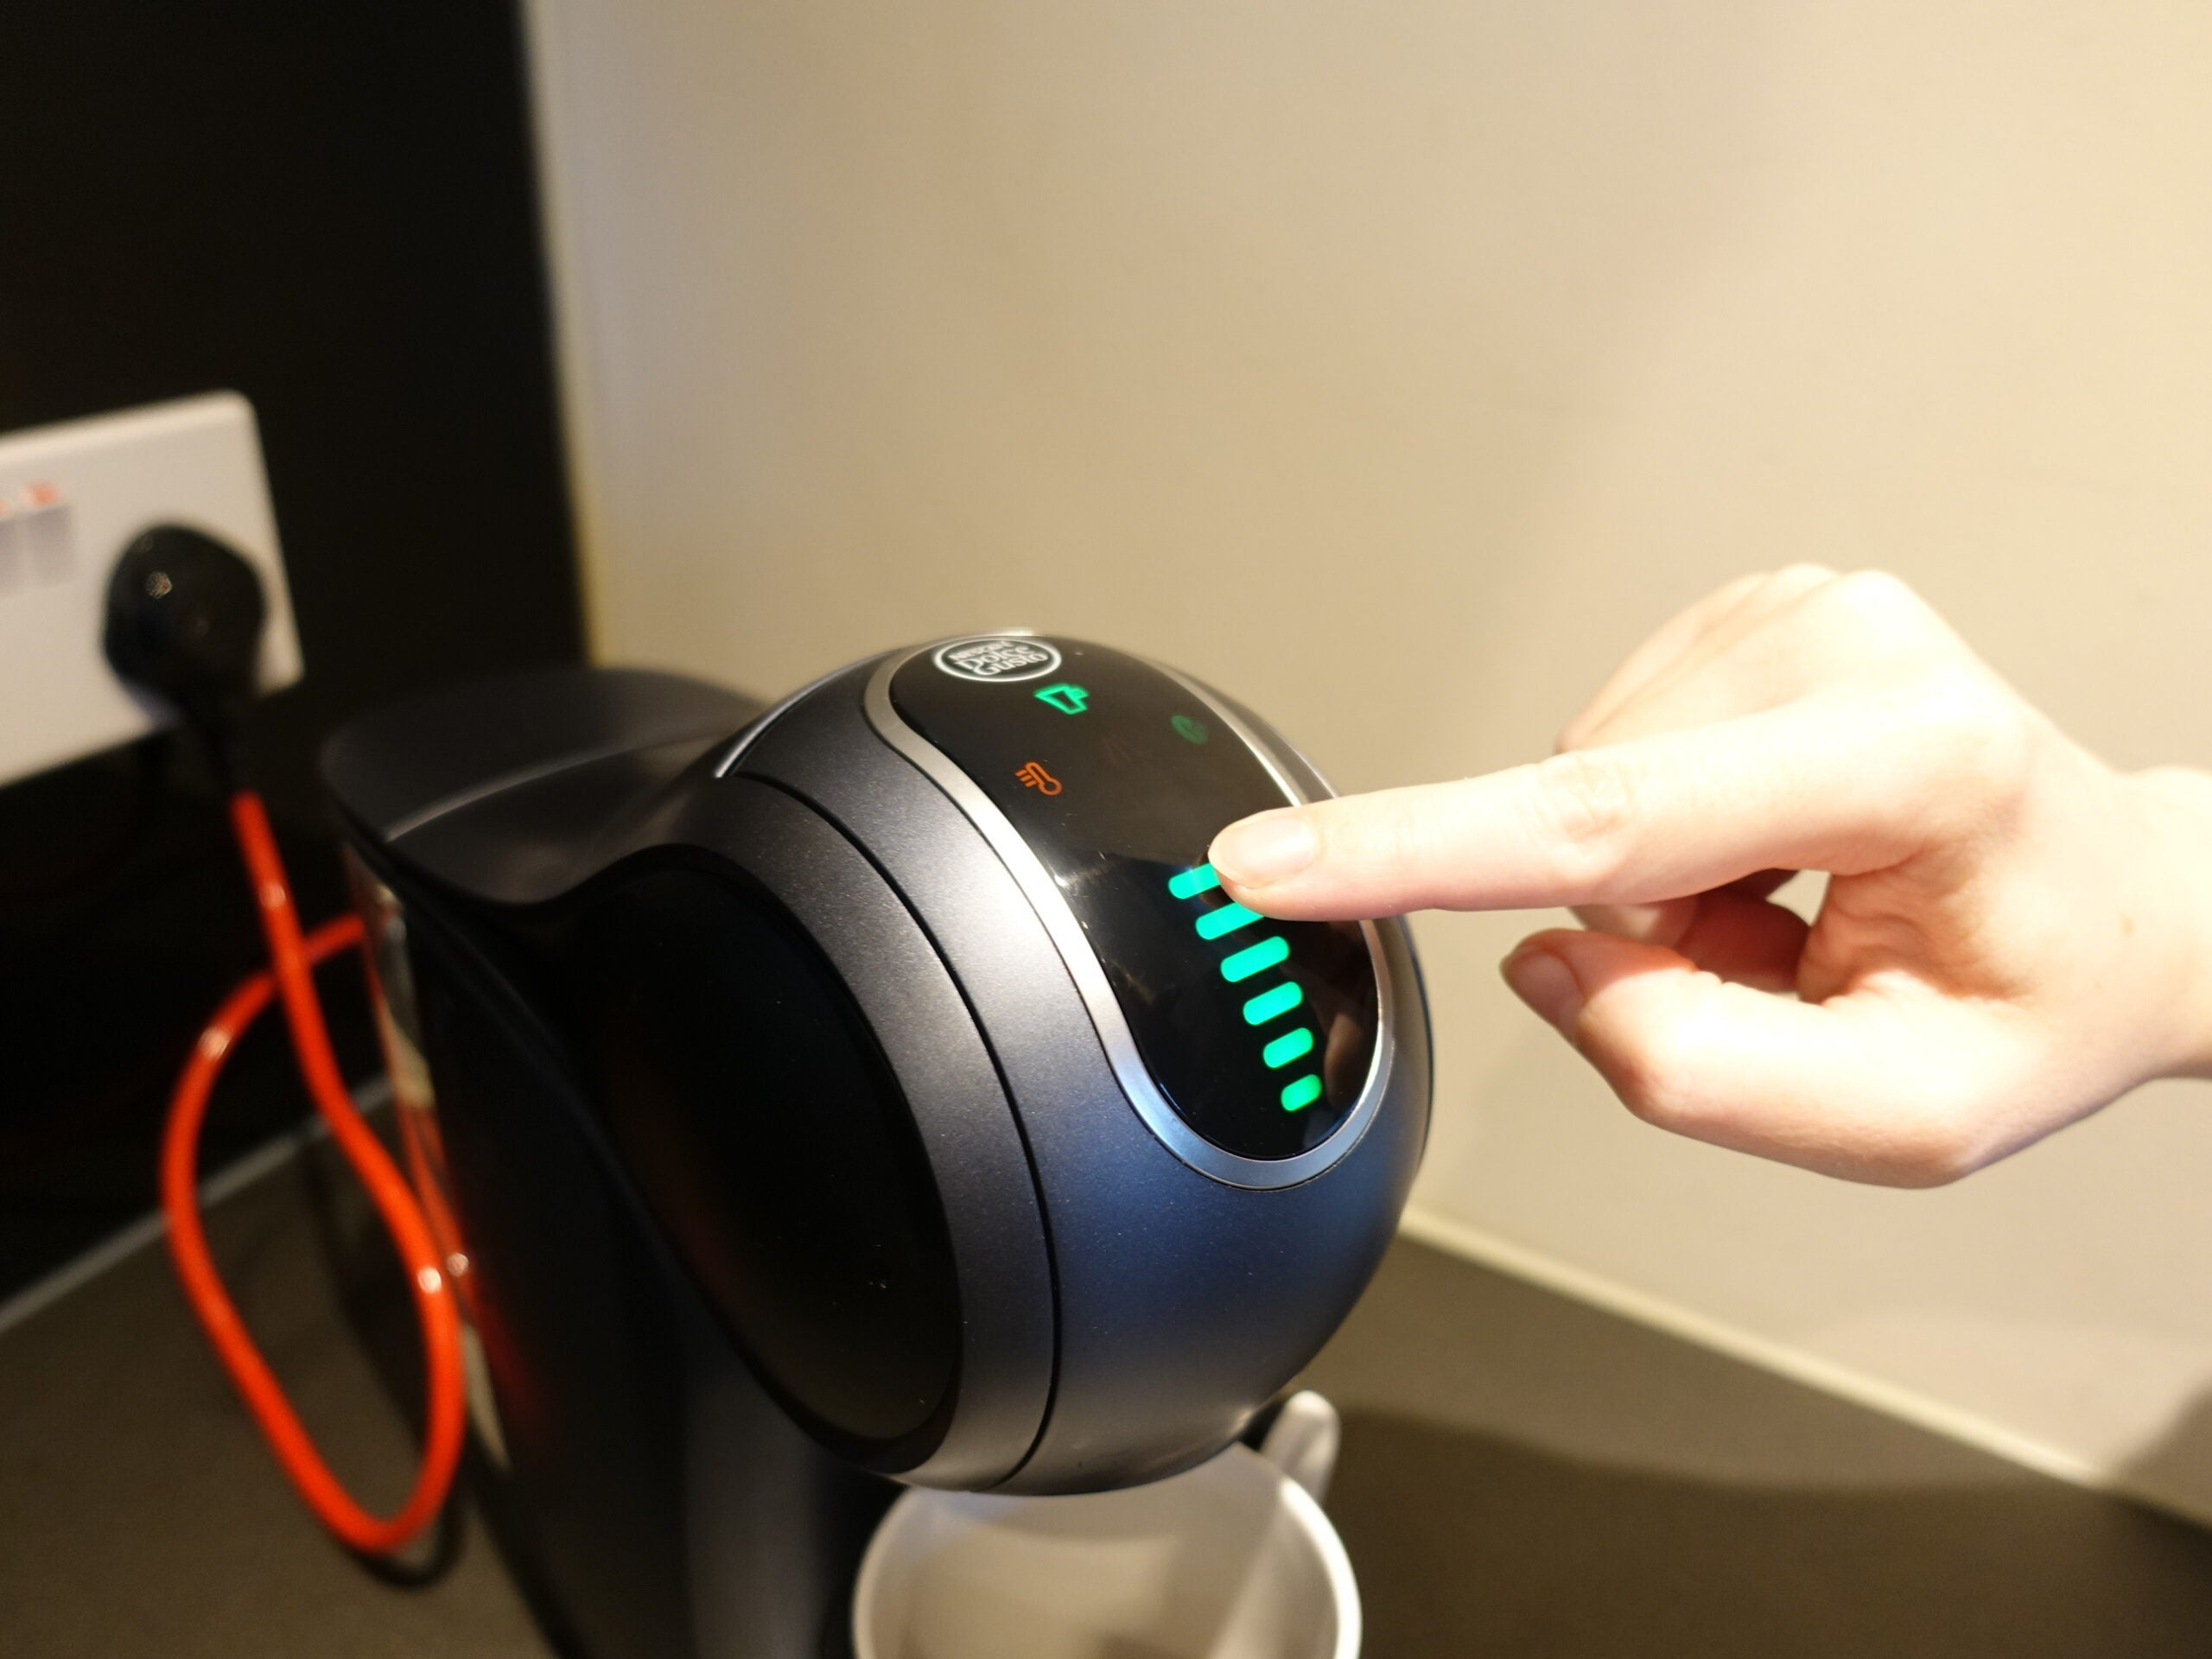 De'Longhi Nescafé Dolce Gusto Genio S Touch controls